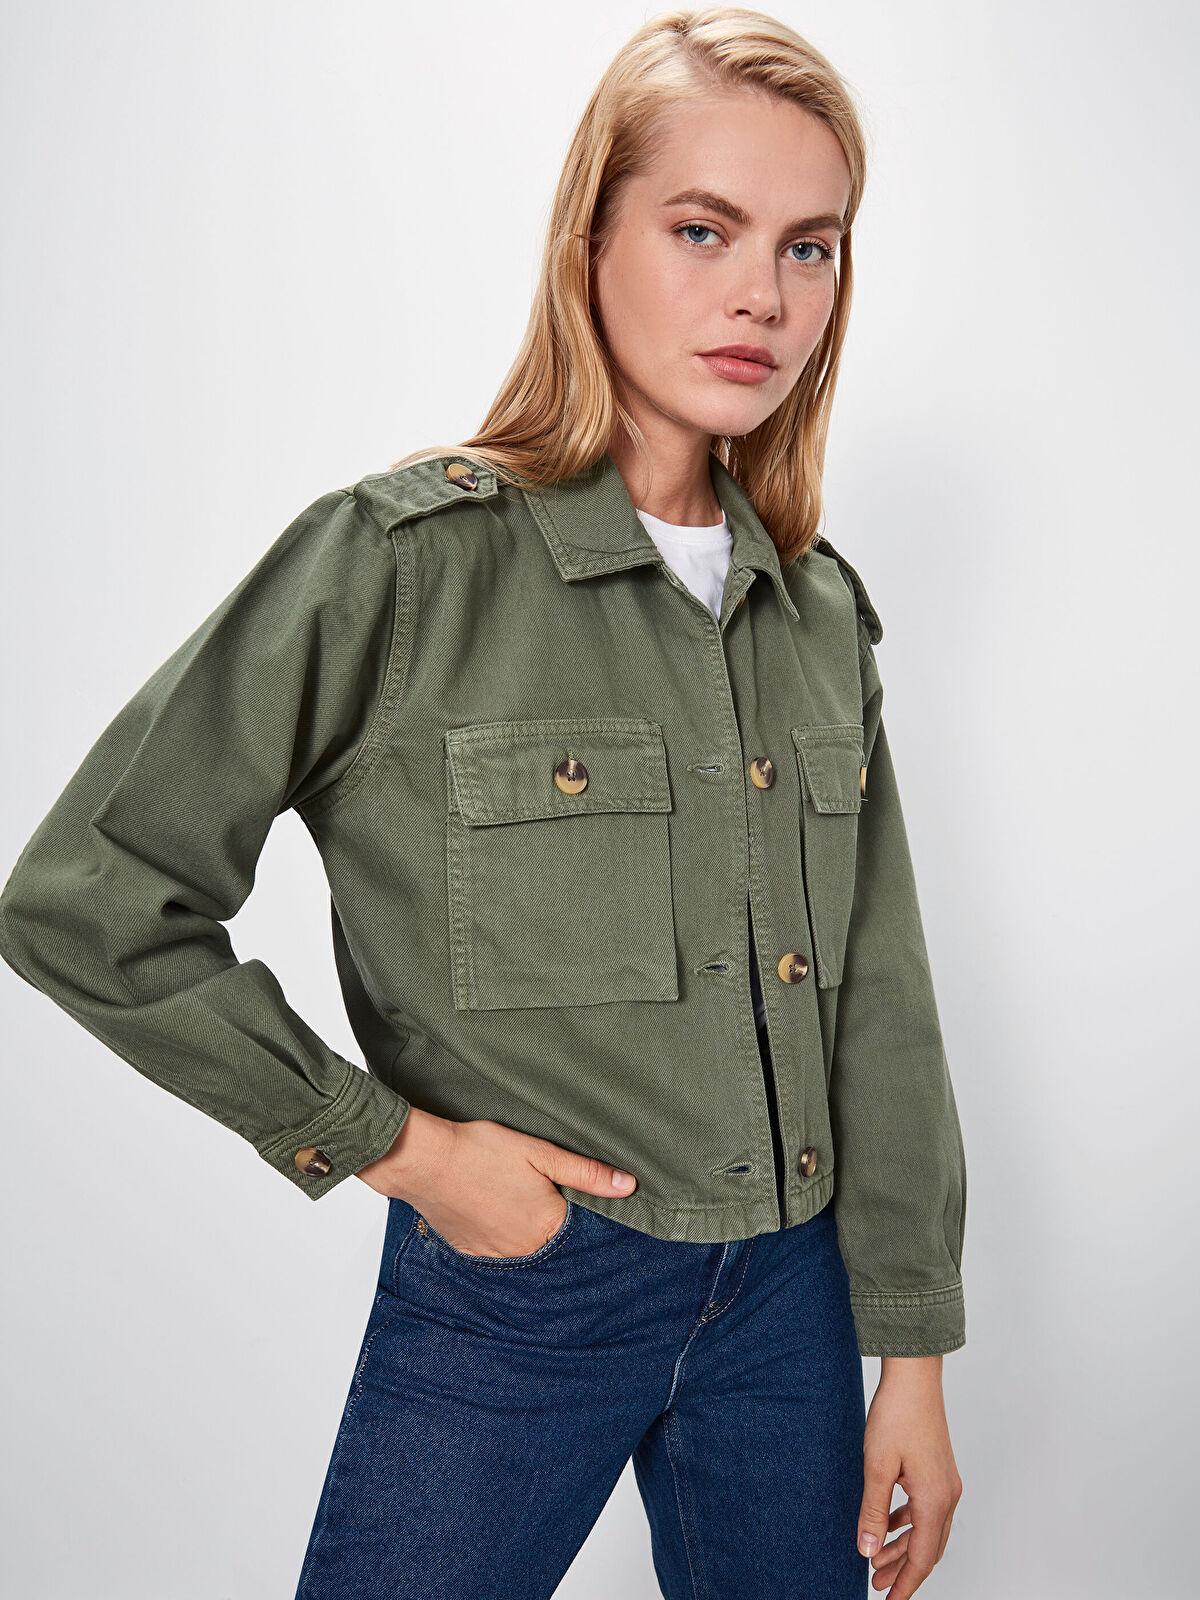 Cep Detaylı Kısa Jean Ceket - LC WAIKIKI